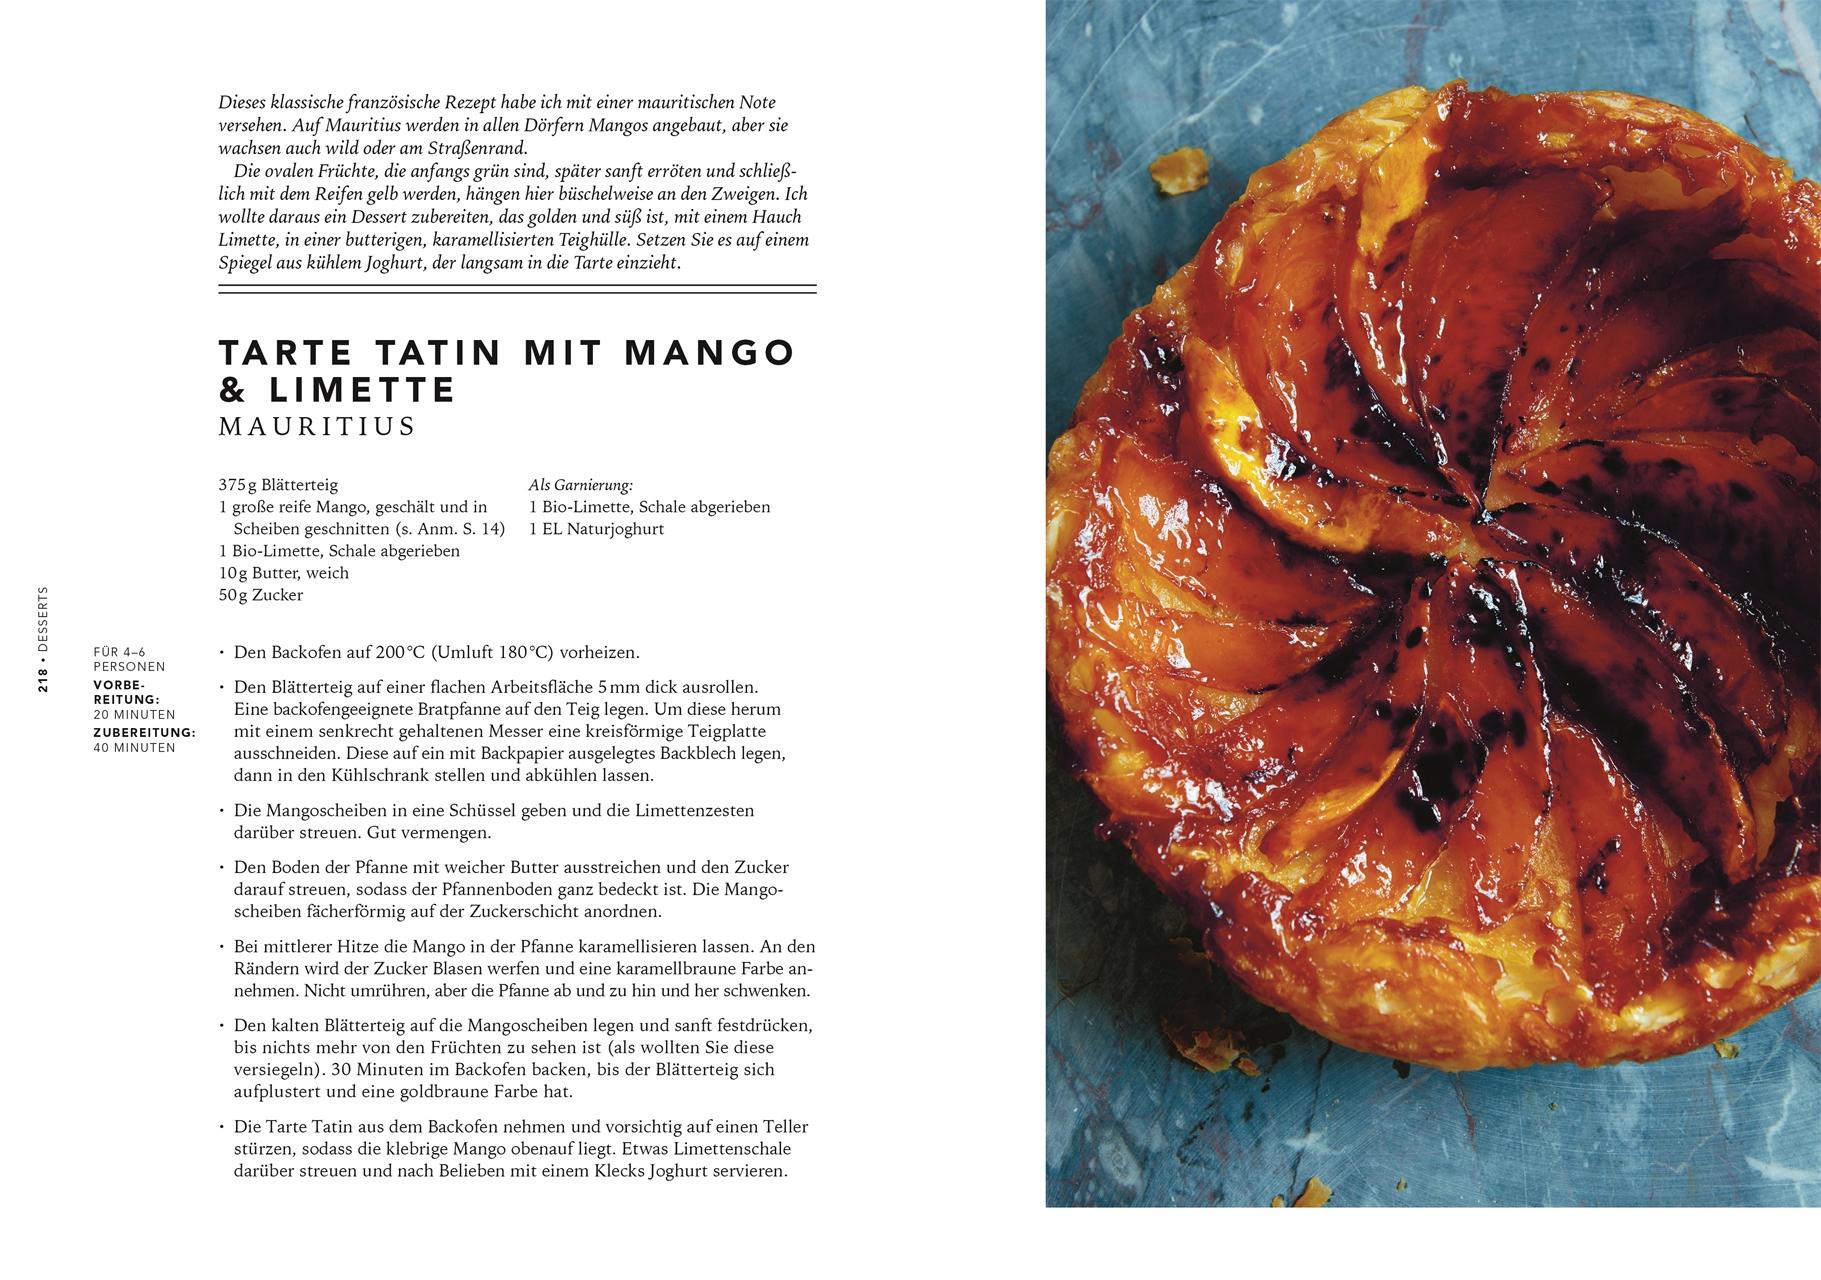 Kreolisch kochen | DK Verlag